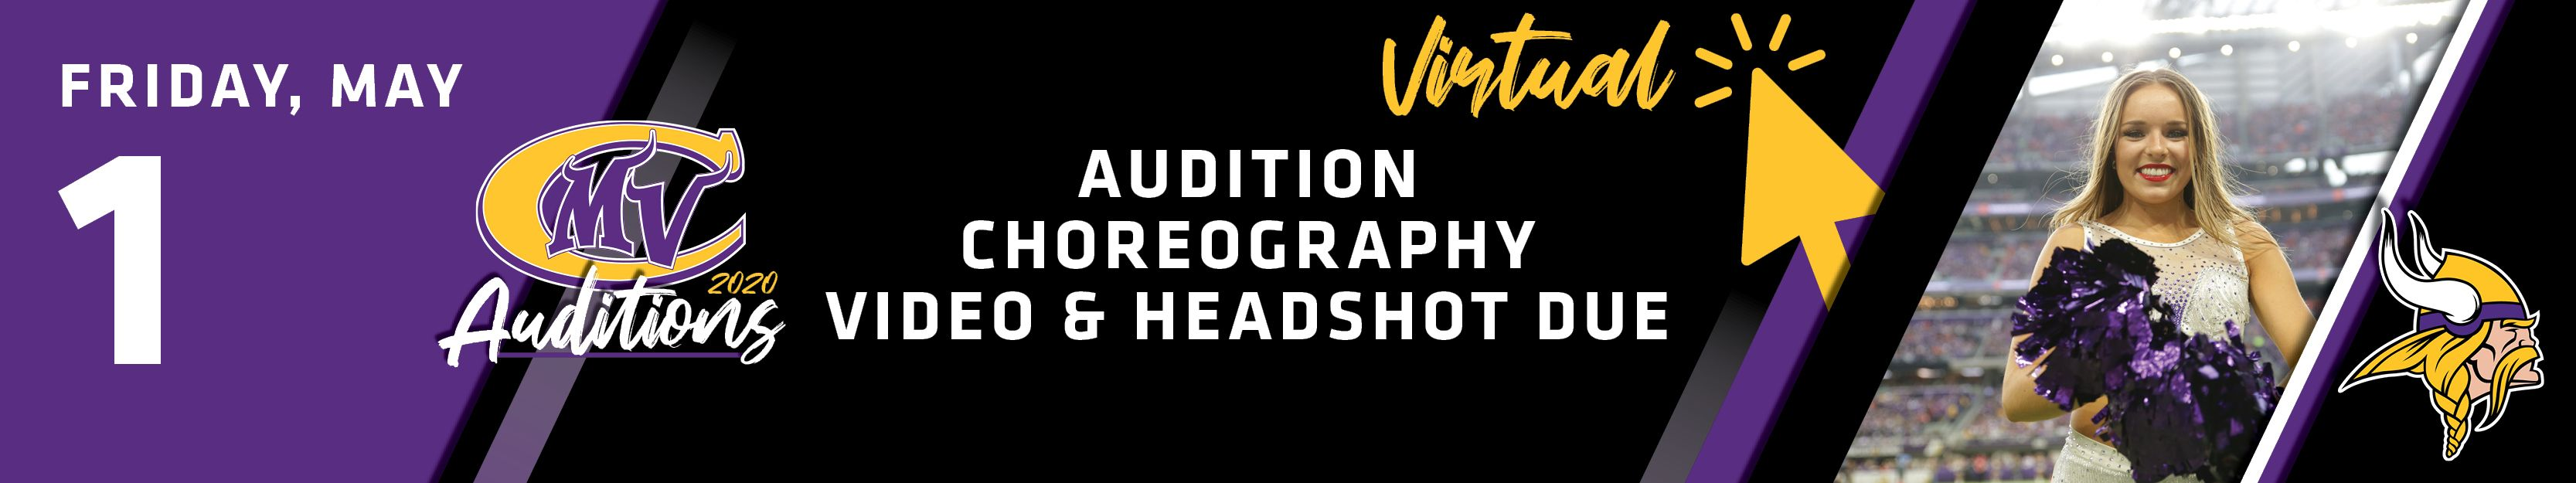 Friday, May 1st | Virtual Audition Choreography Videos & Headshot Due